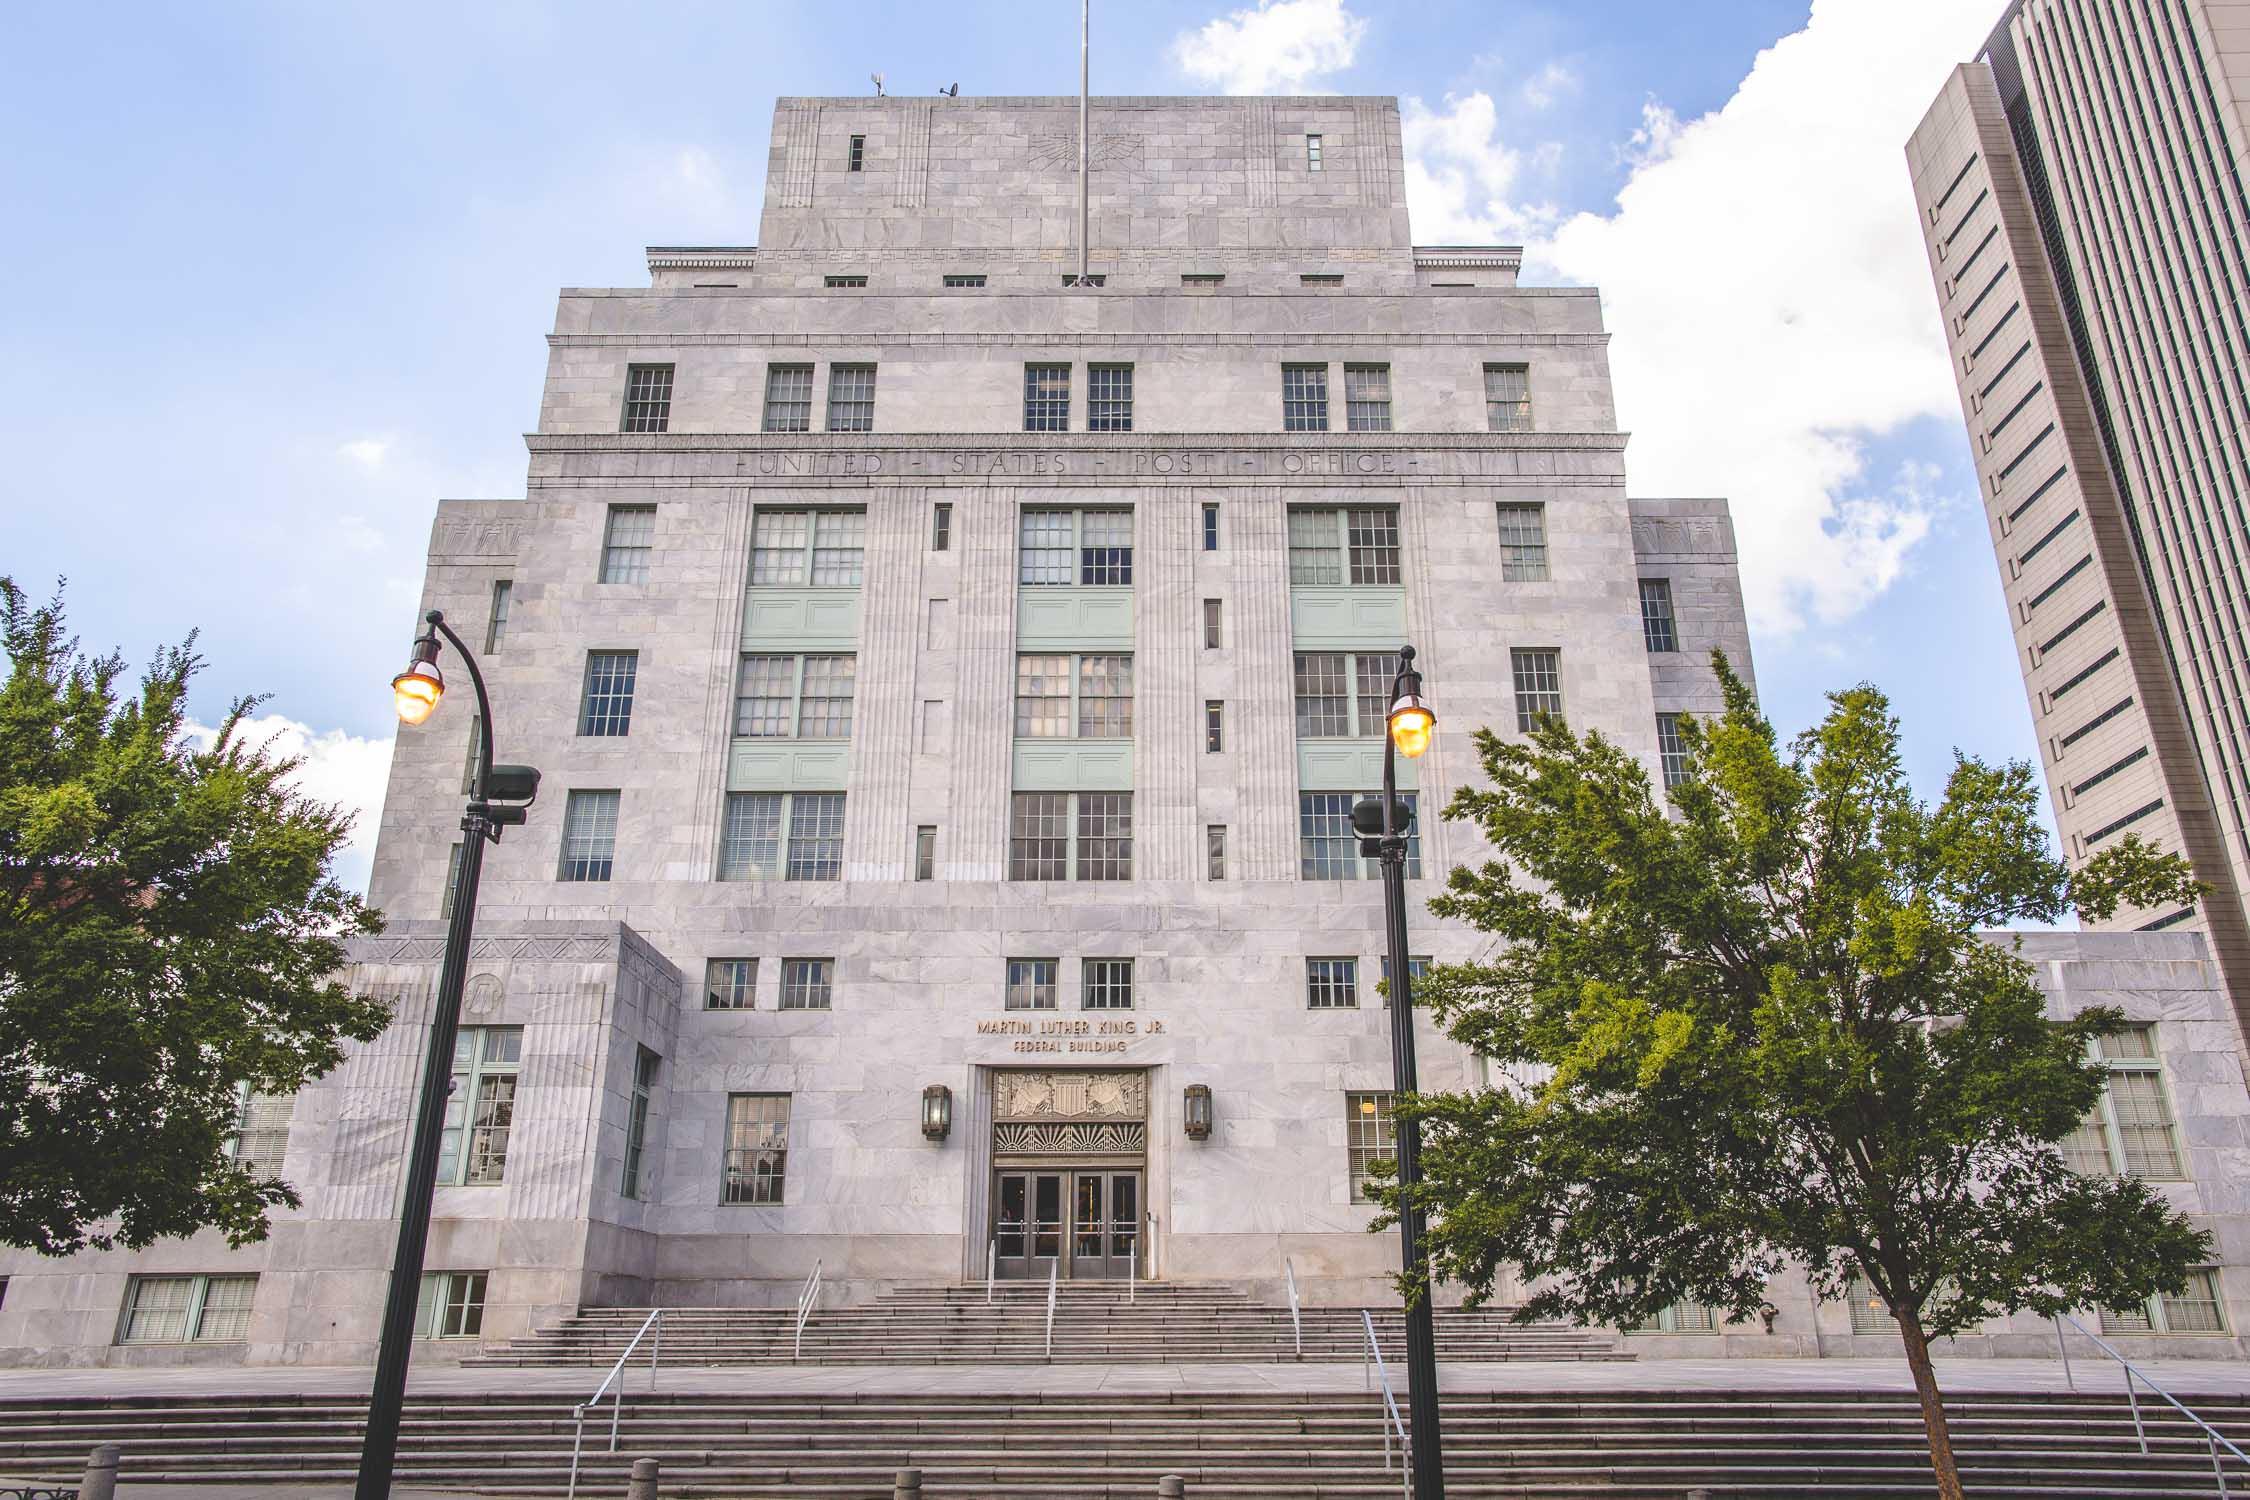 Martin-Luther-King-Jr-Federal-Building-Atlanta-Erik-Meadows